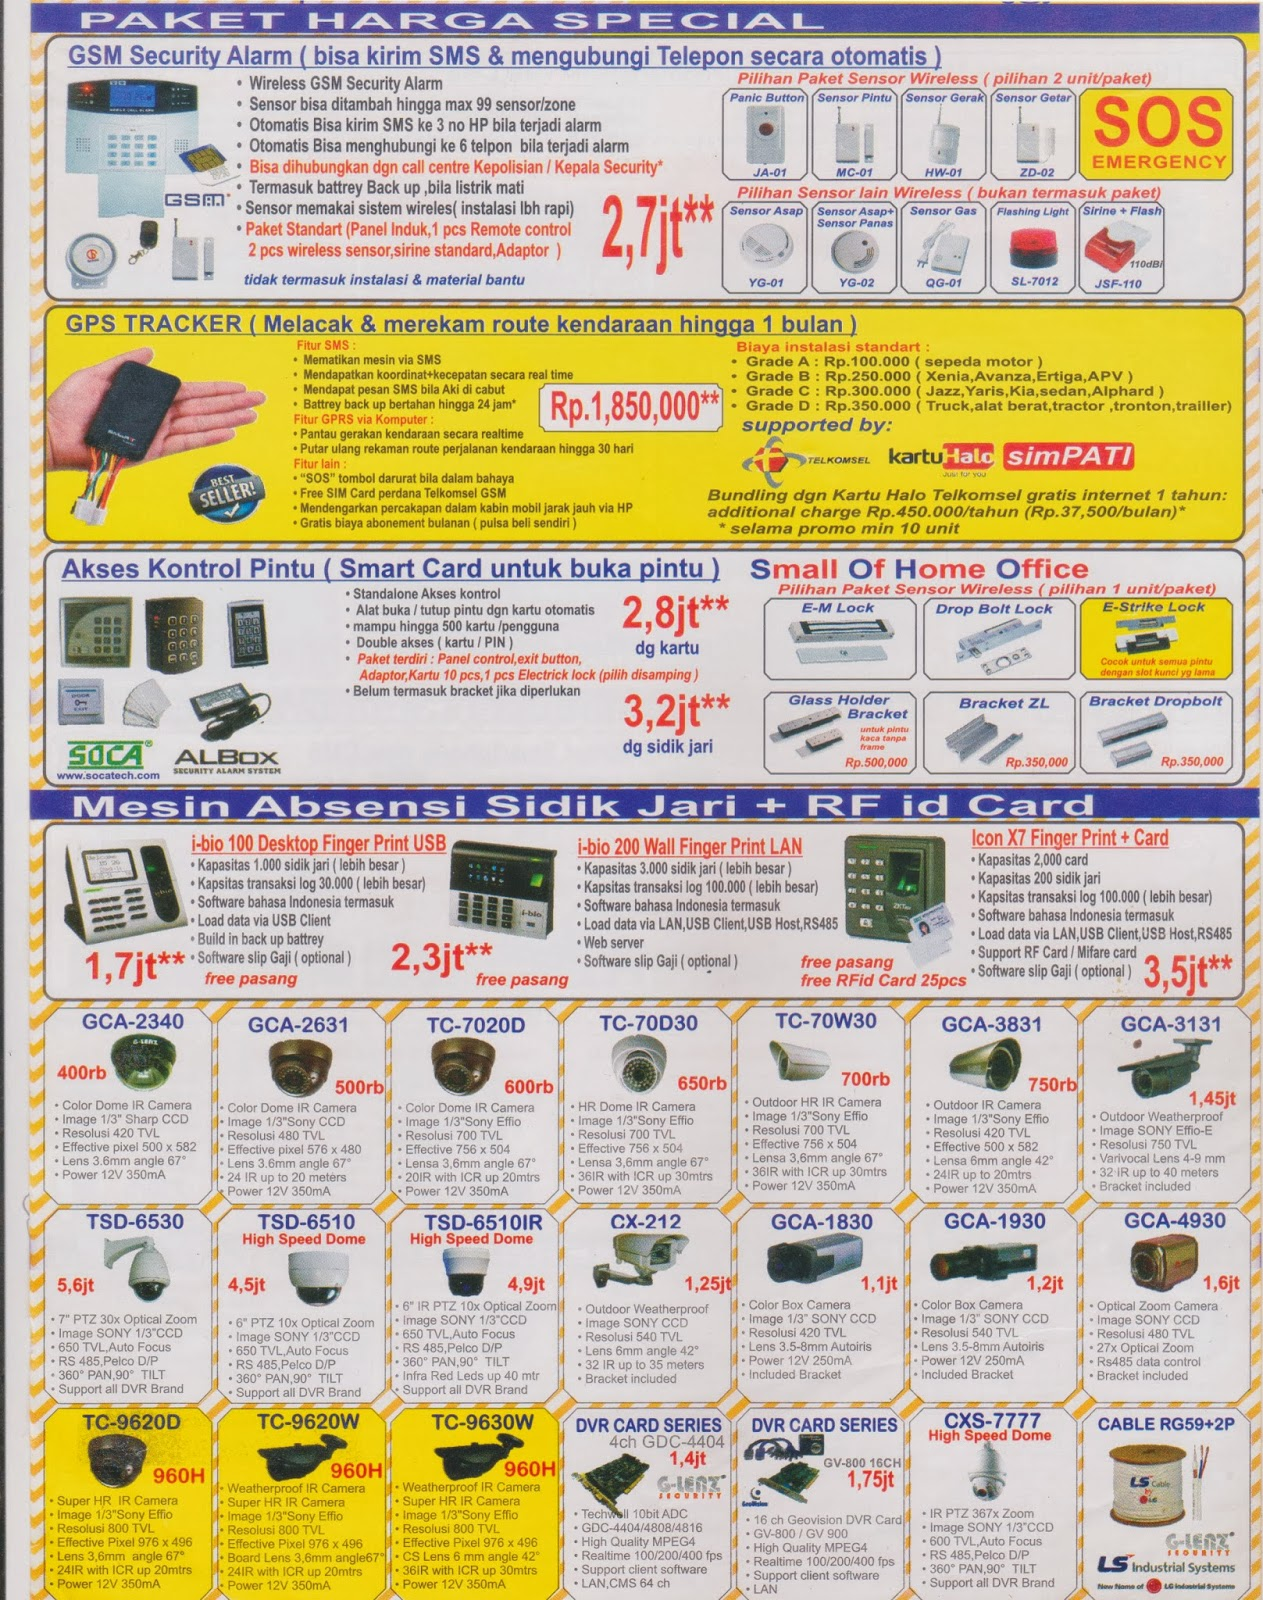 Daftar harga Baru Paket CCTV G-lenz ip camera Cloud Suport Modem GSM